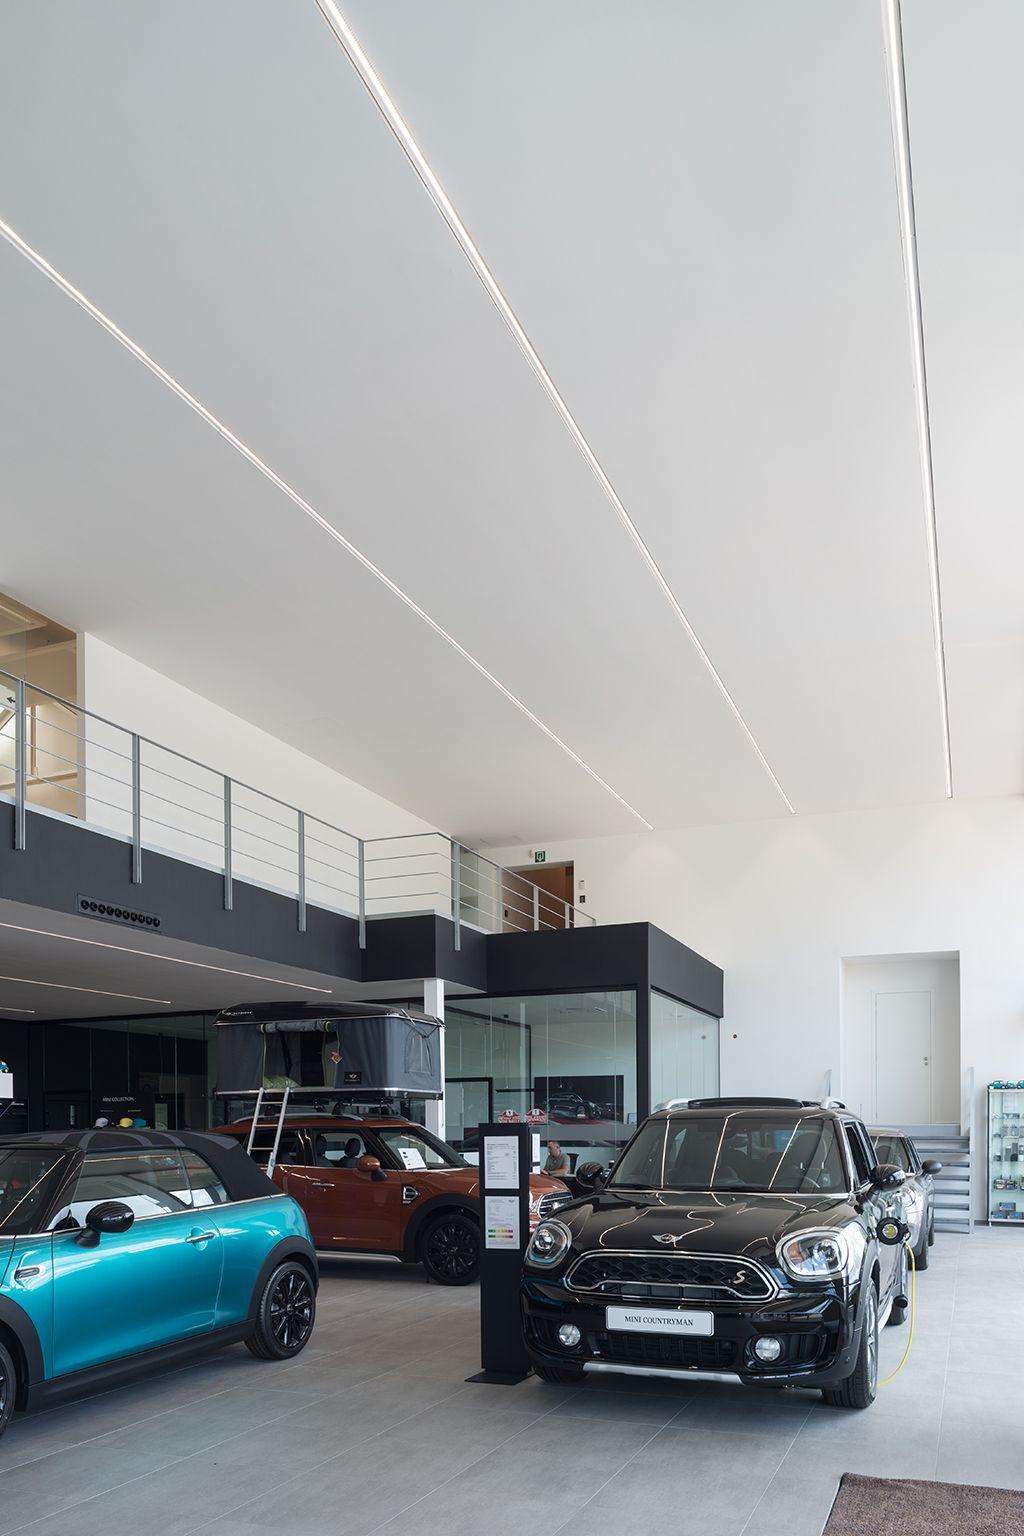 Supermodular Drupl Lighting At A Car Showroom In 2019